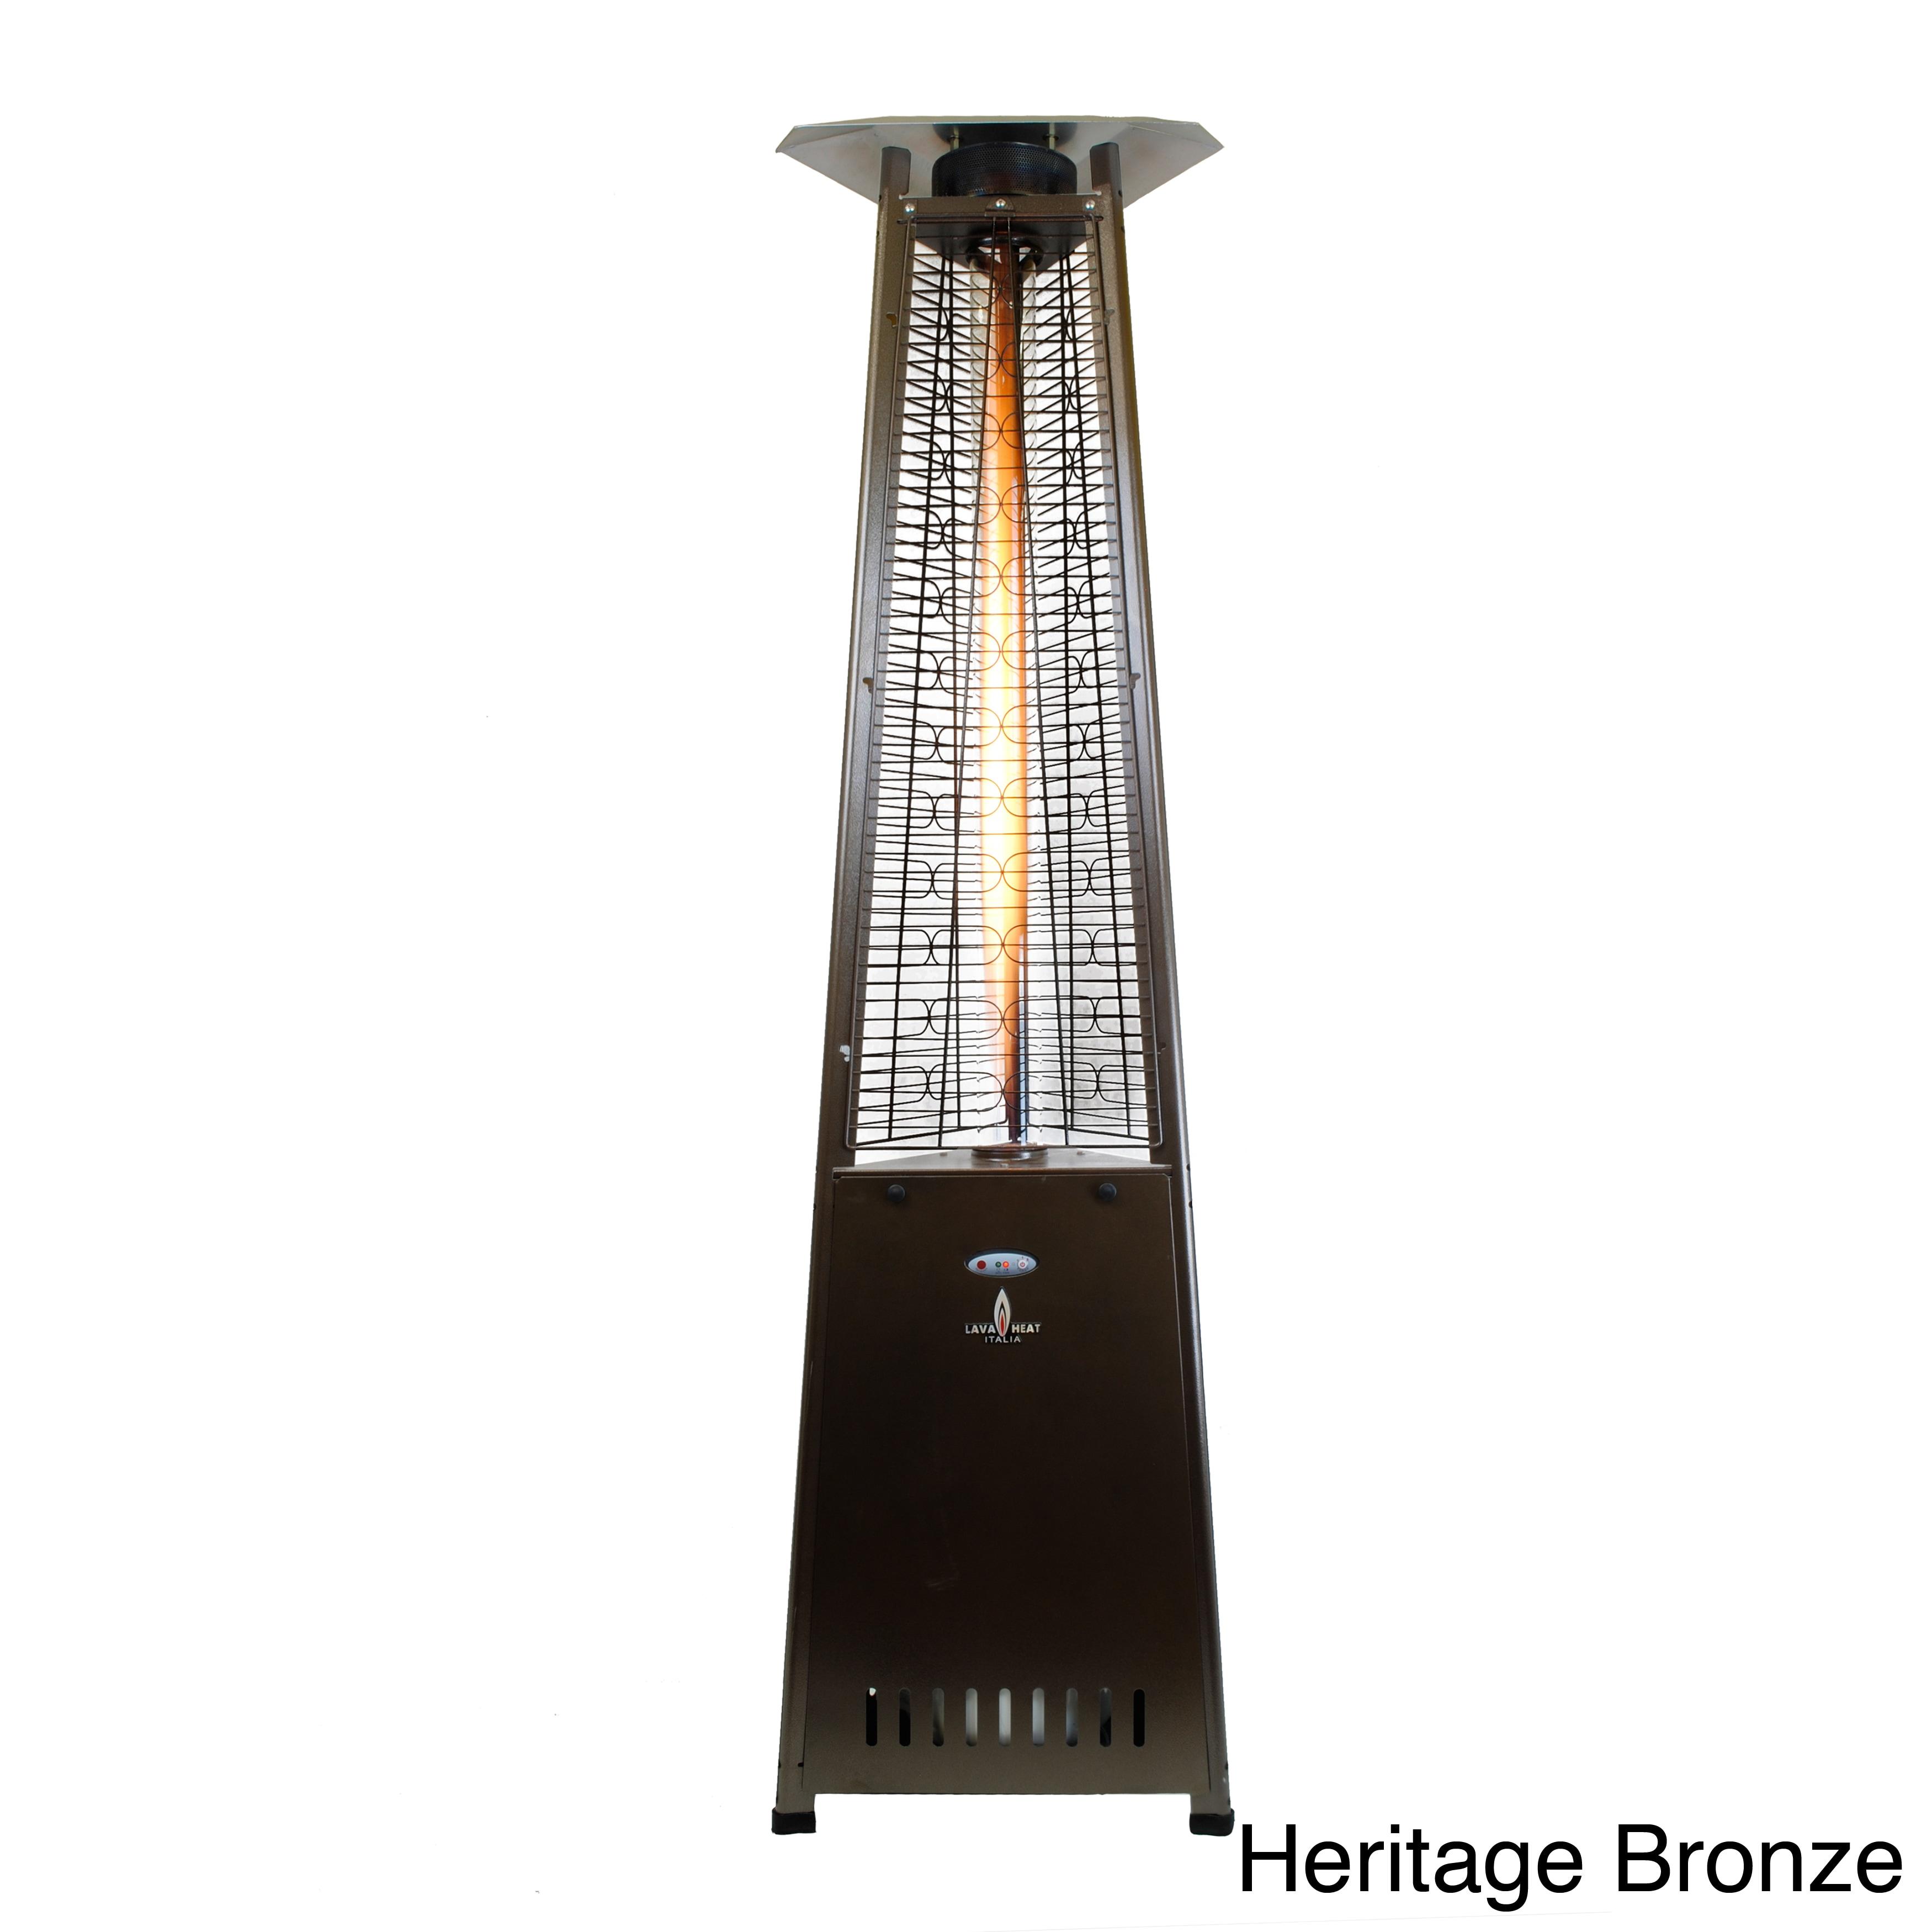 Lava Heat 2G 66 000 BTU mercial Outdoor Patio Heater Free